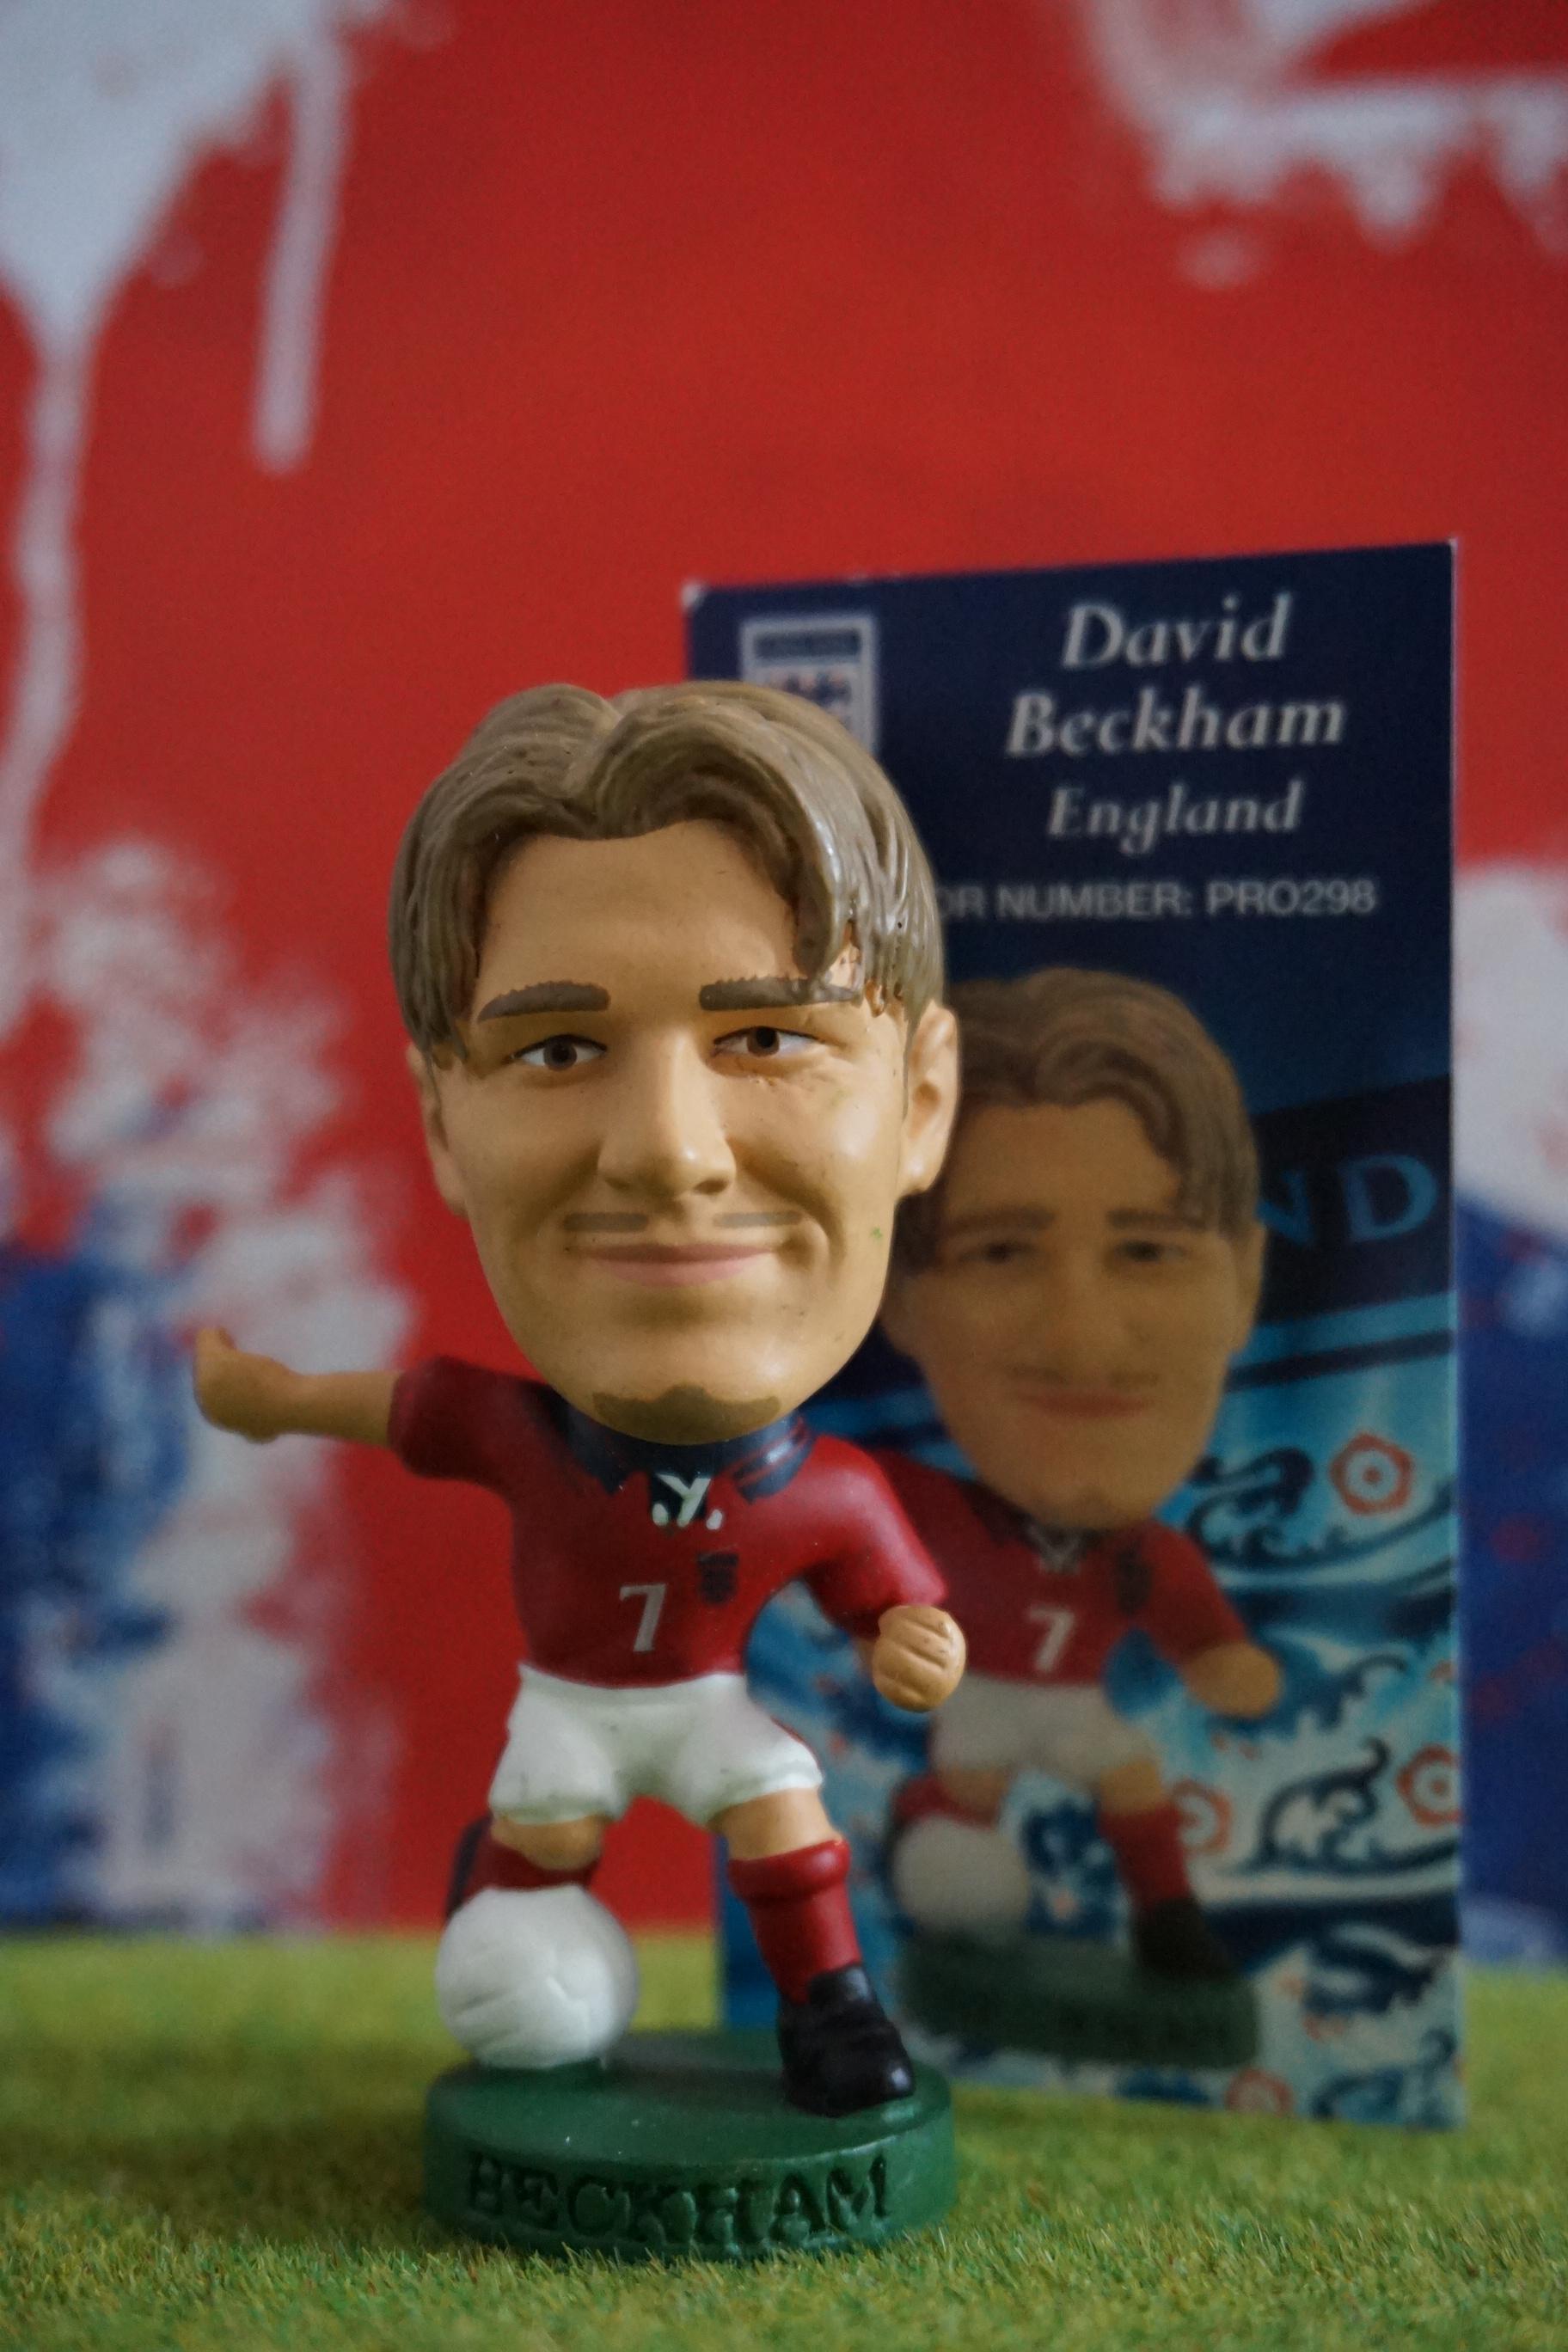 PRO298 David Beckham